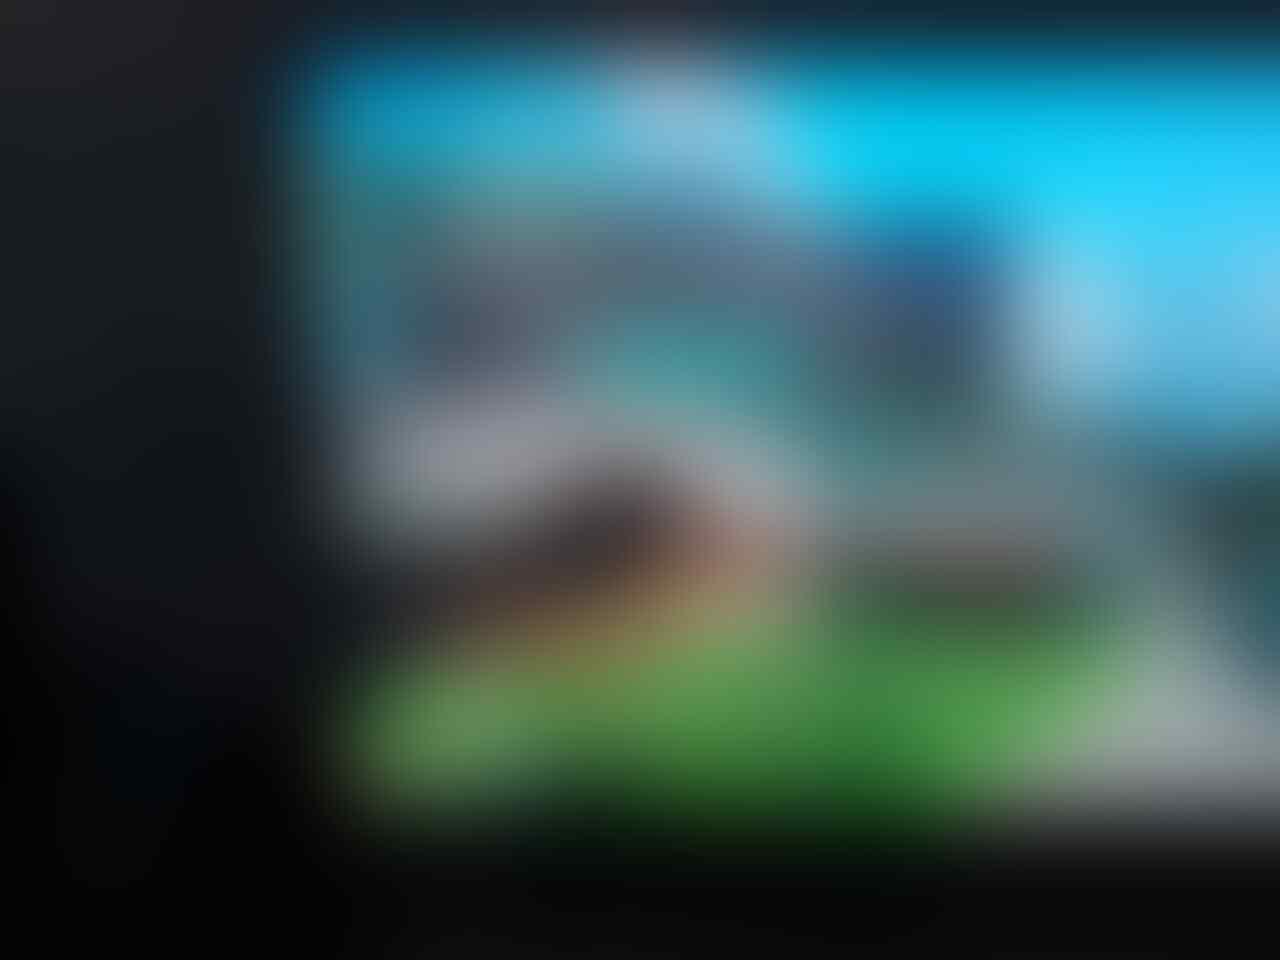 4K & 8K Ultra HD TV Discussion Forum - Part 1